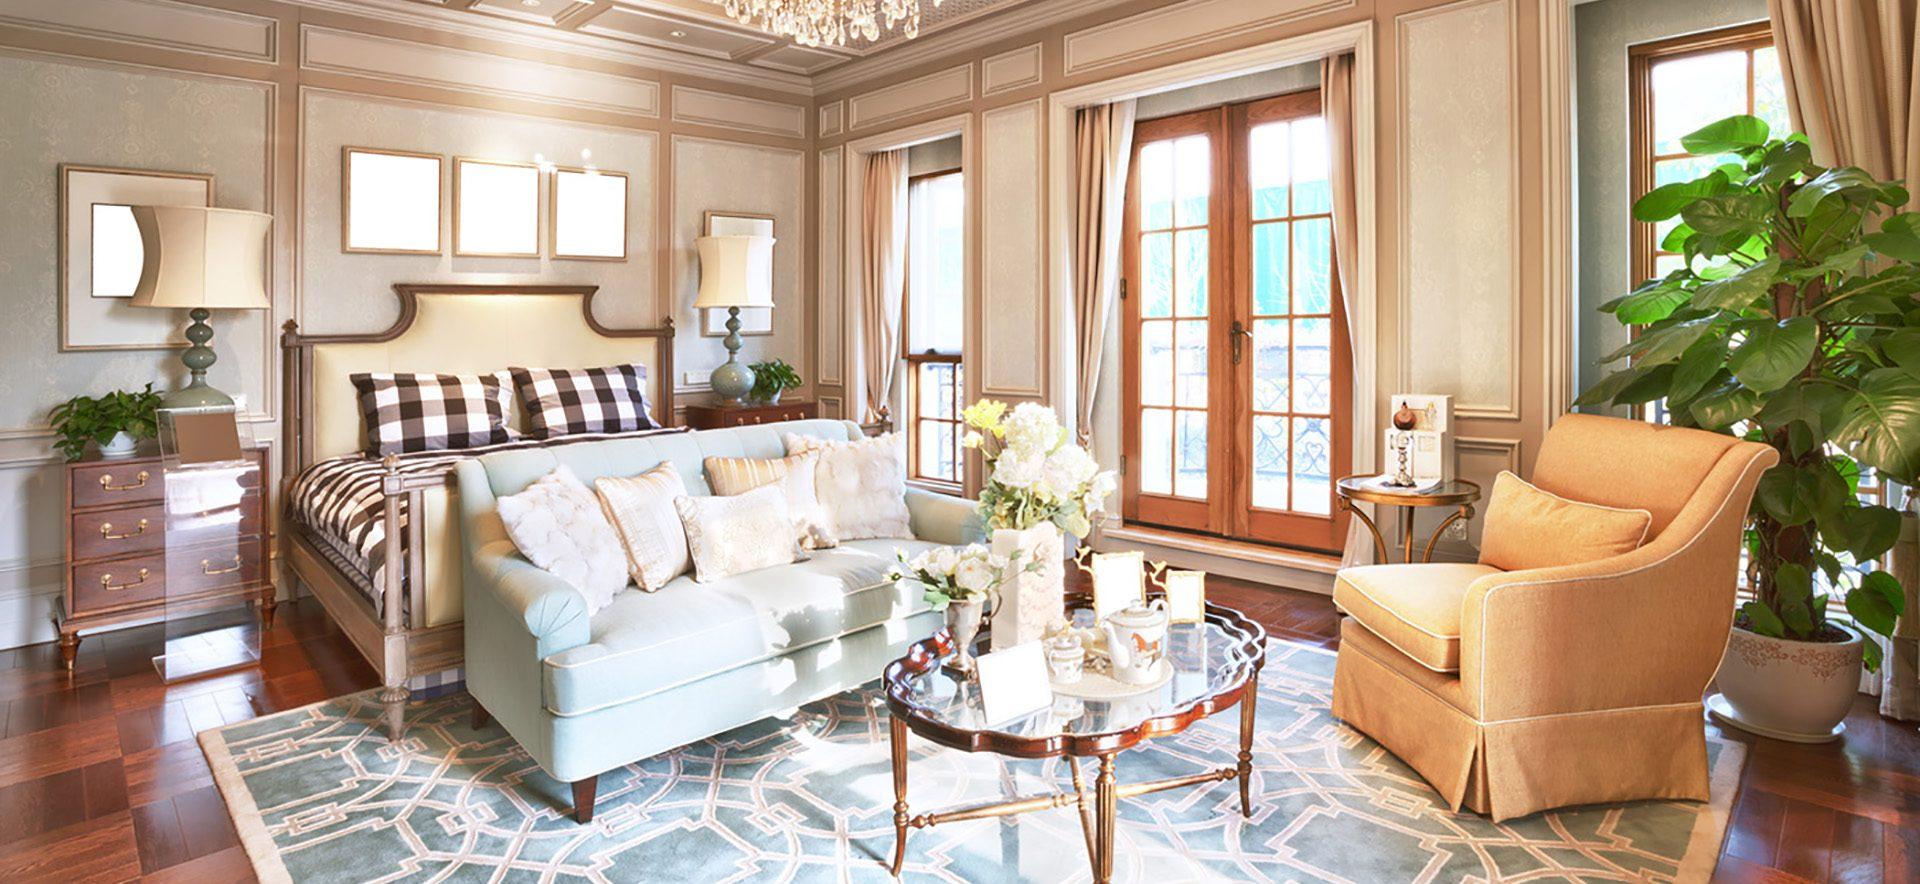 Certified Residential Interior Designer Header image aspect ratio 100 46